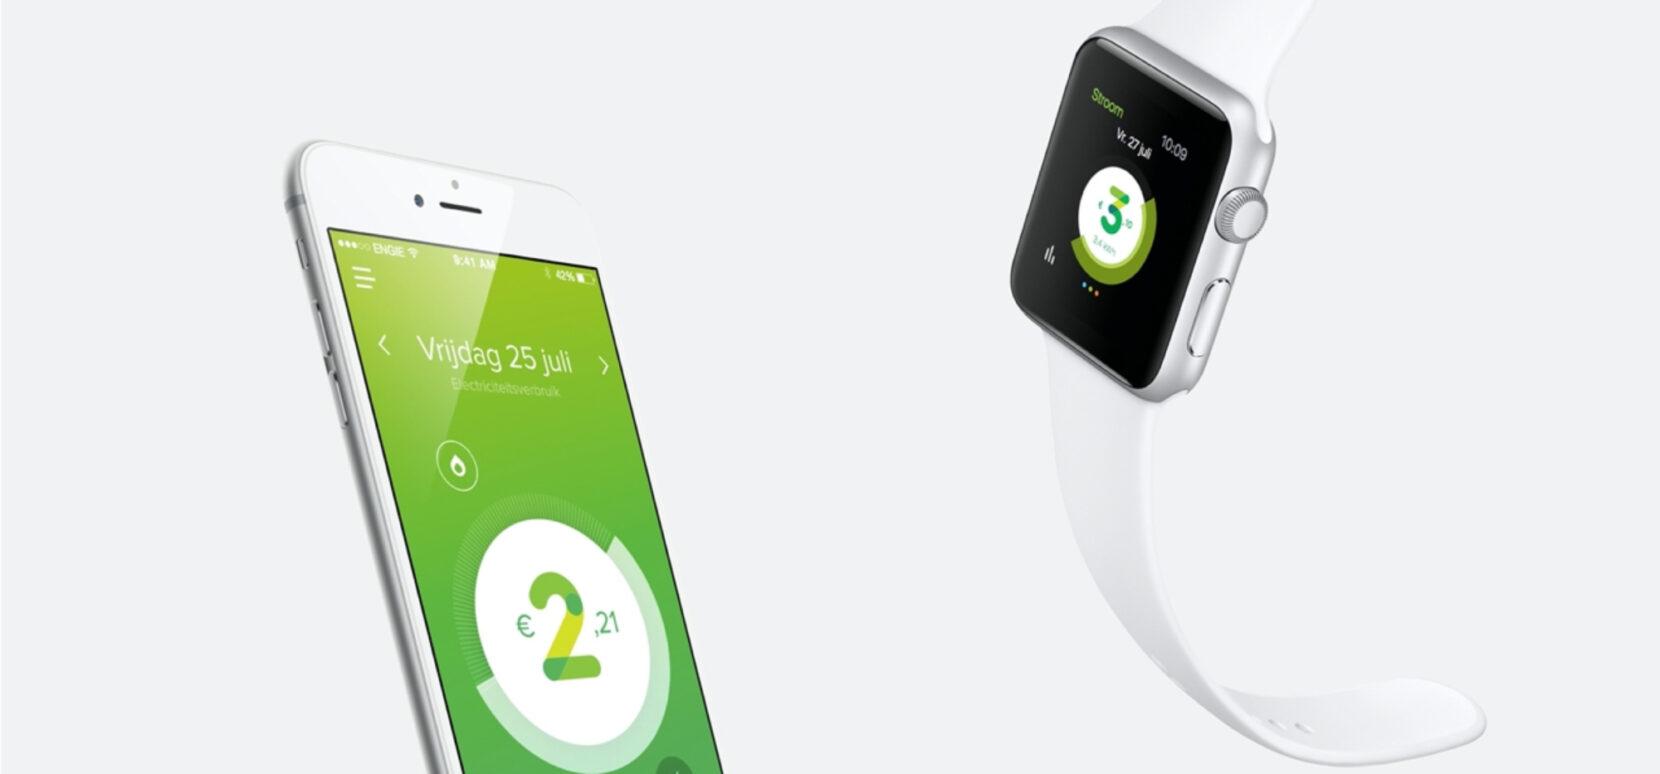 Engie smartphone app case header